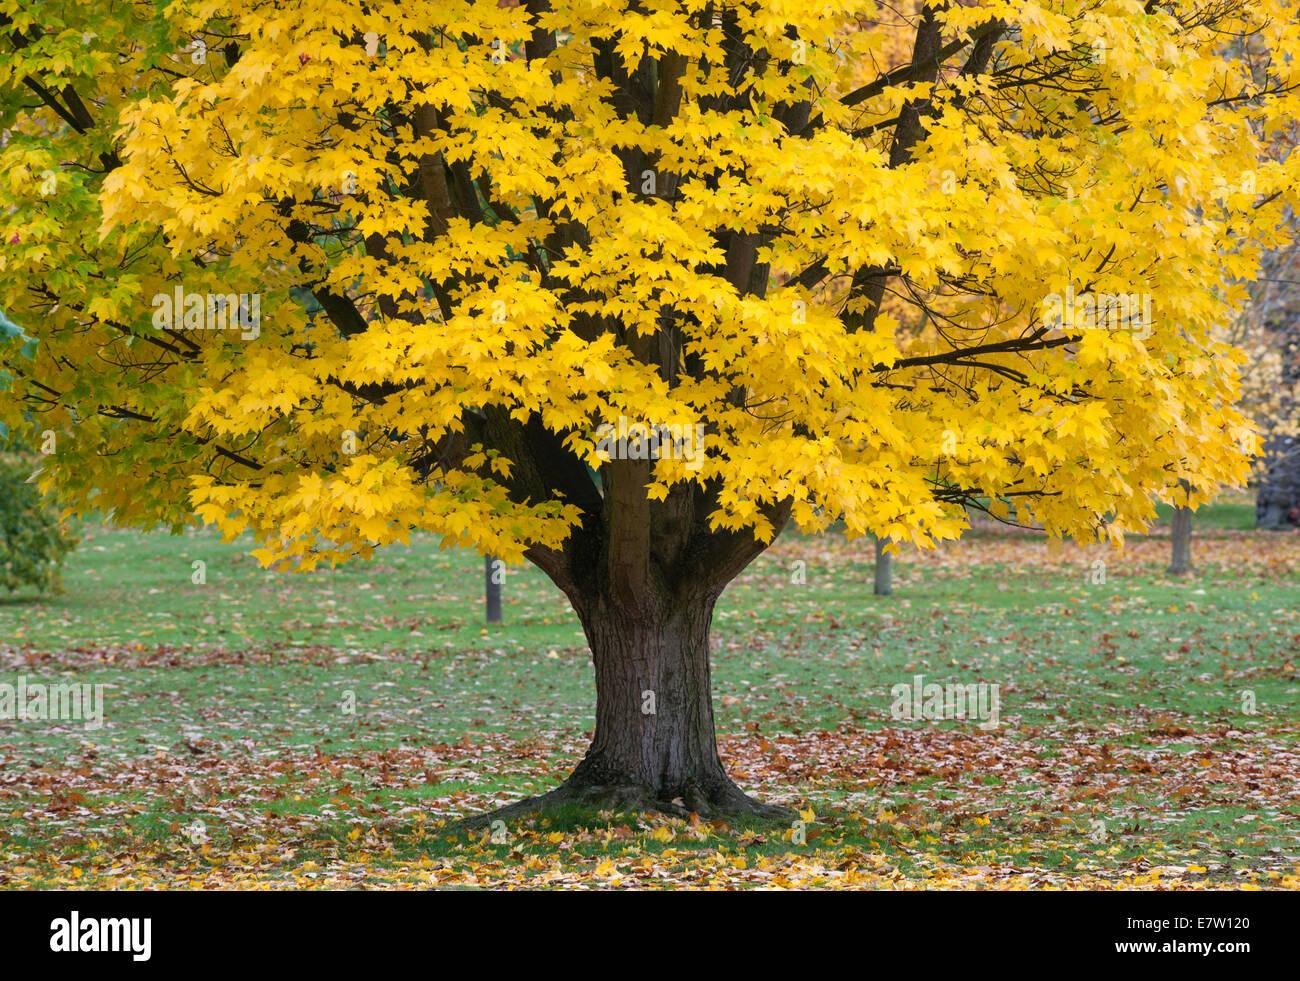 Royal Botanic Gardens, Kew, Londres. Un formulario amarillo de Acer rubrum (arce rojo o arce de pantano) tiene un aspecto espectacular en otoño Foto de stock